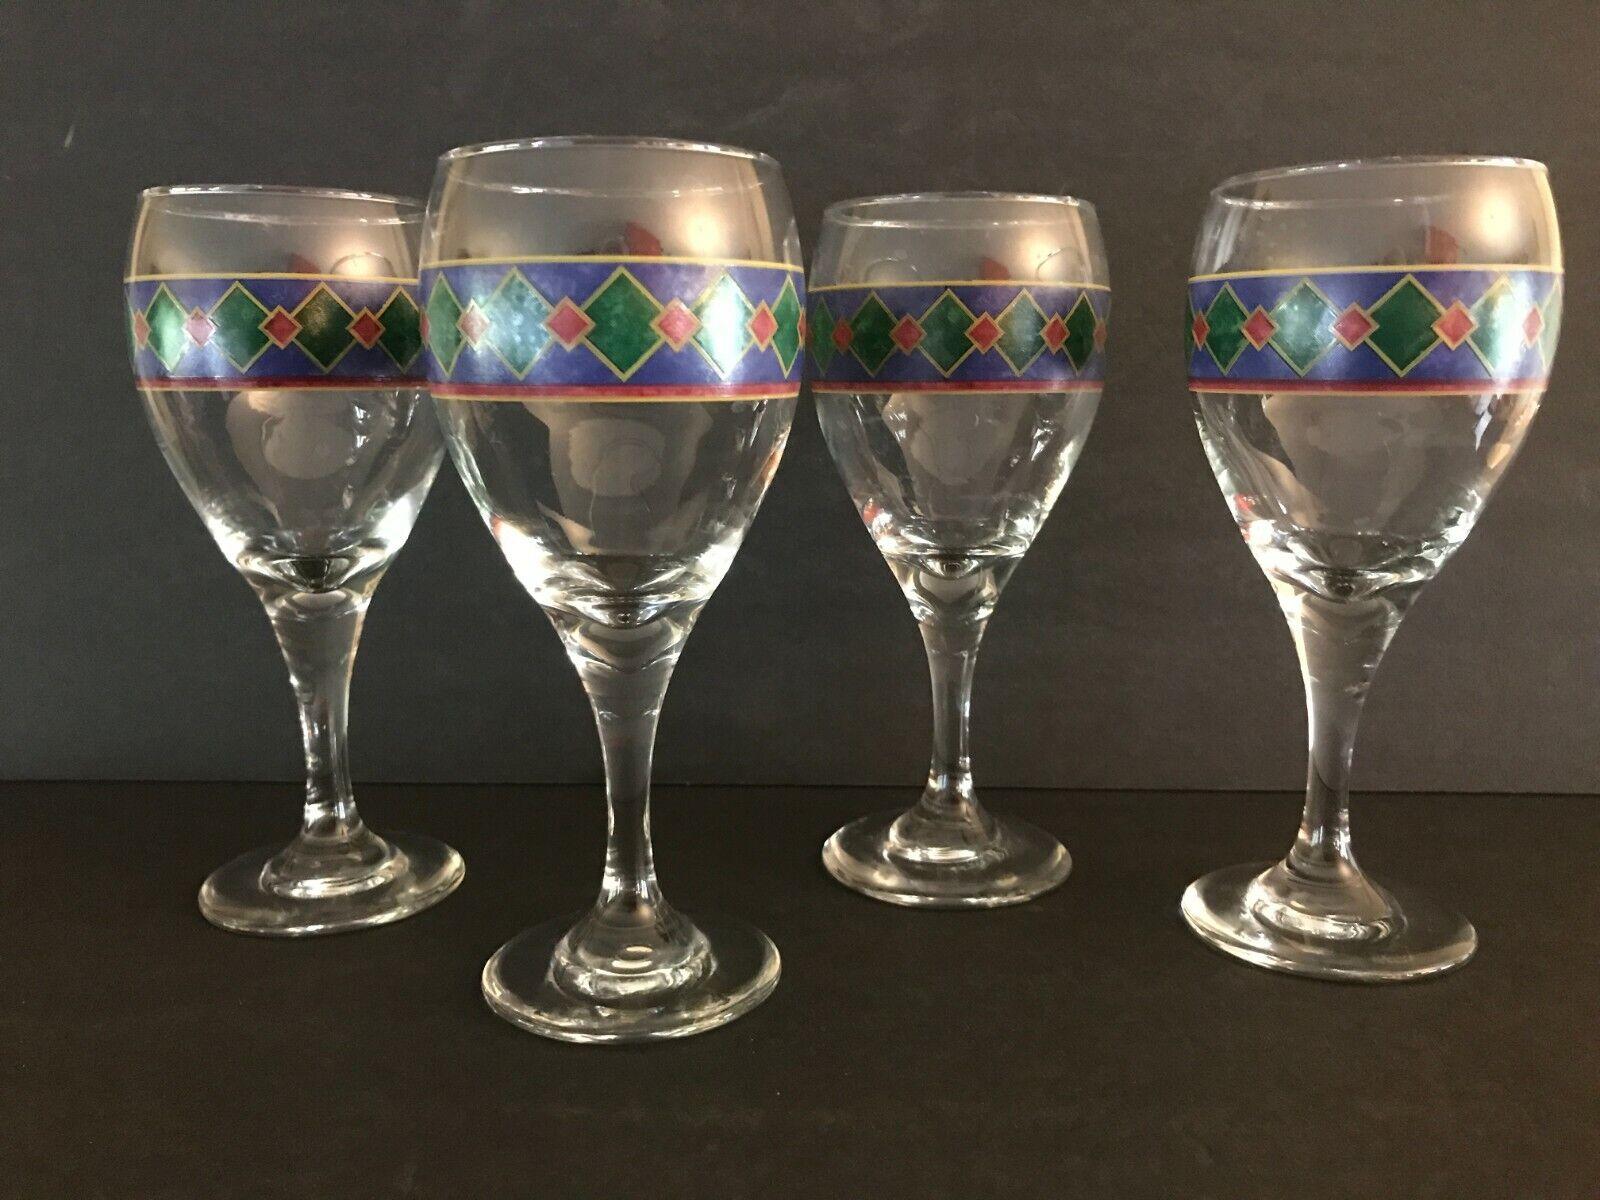 Set Of 4 PFALTZGRAFF AMALFI MEDITERRANEAN 7 3/8 Wine Glass Goblets - $14.99